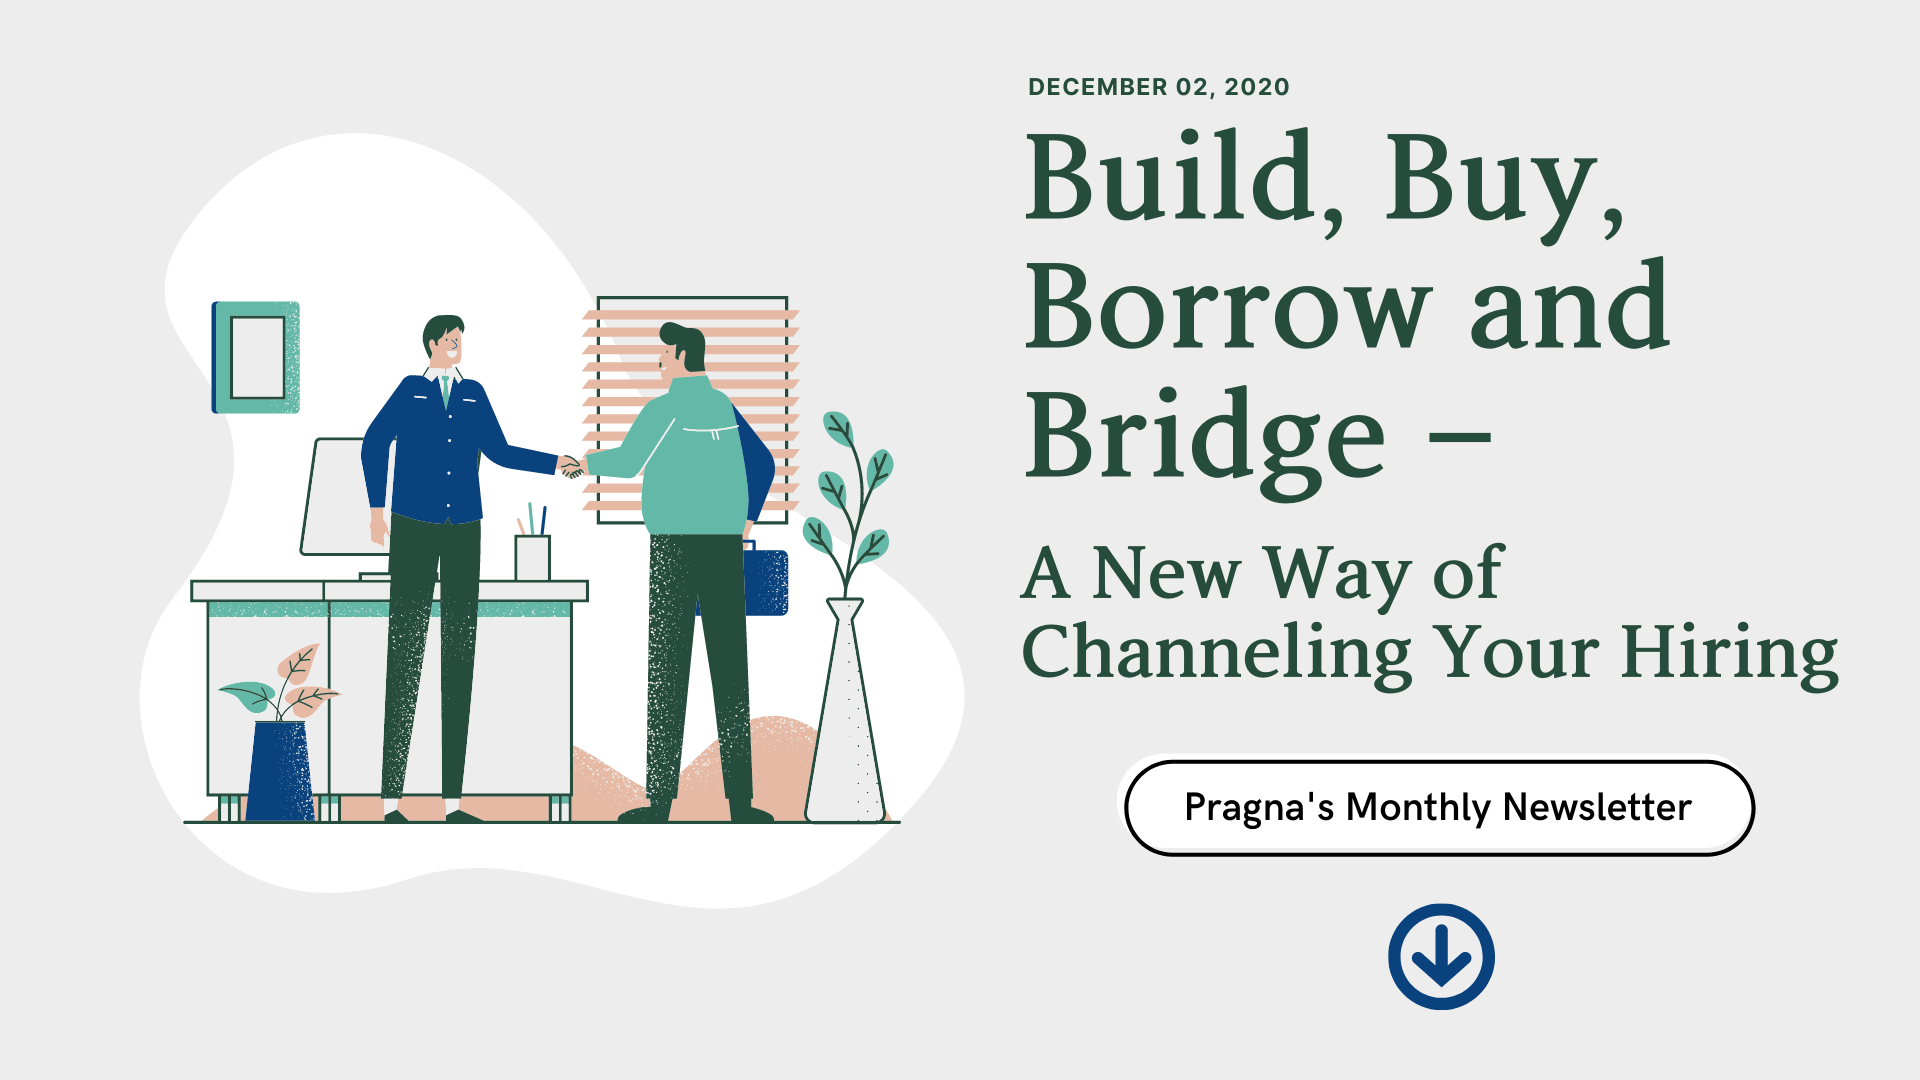 Build, Buy Borrow and Bridge